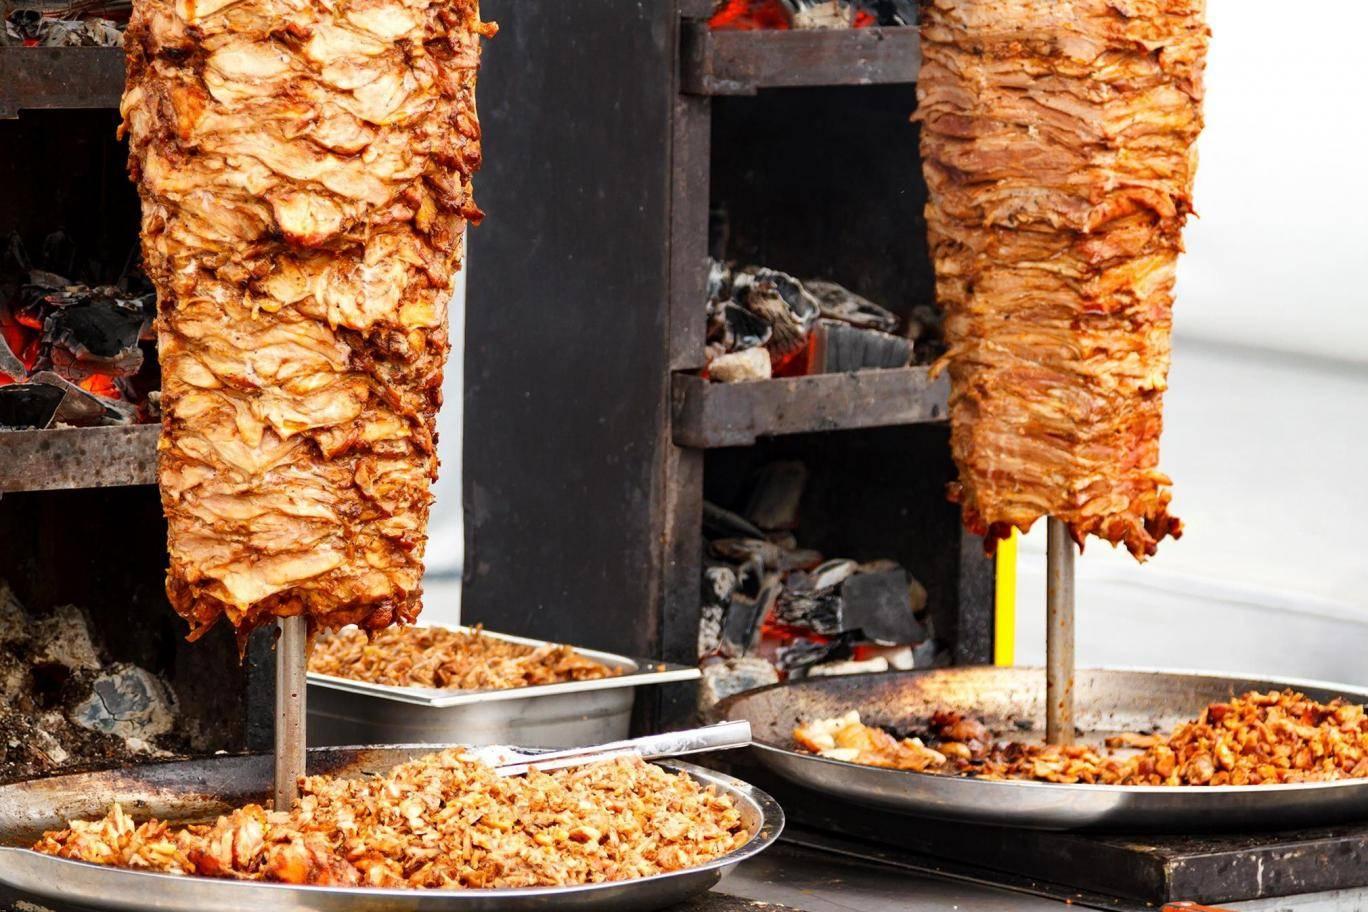 Best British kebab shops revealed at annual awards ceremony